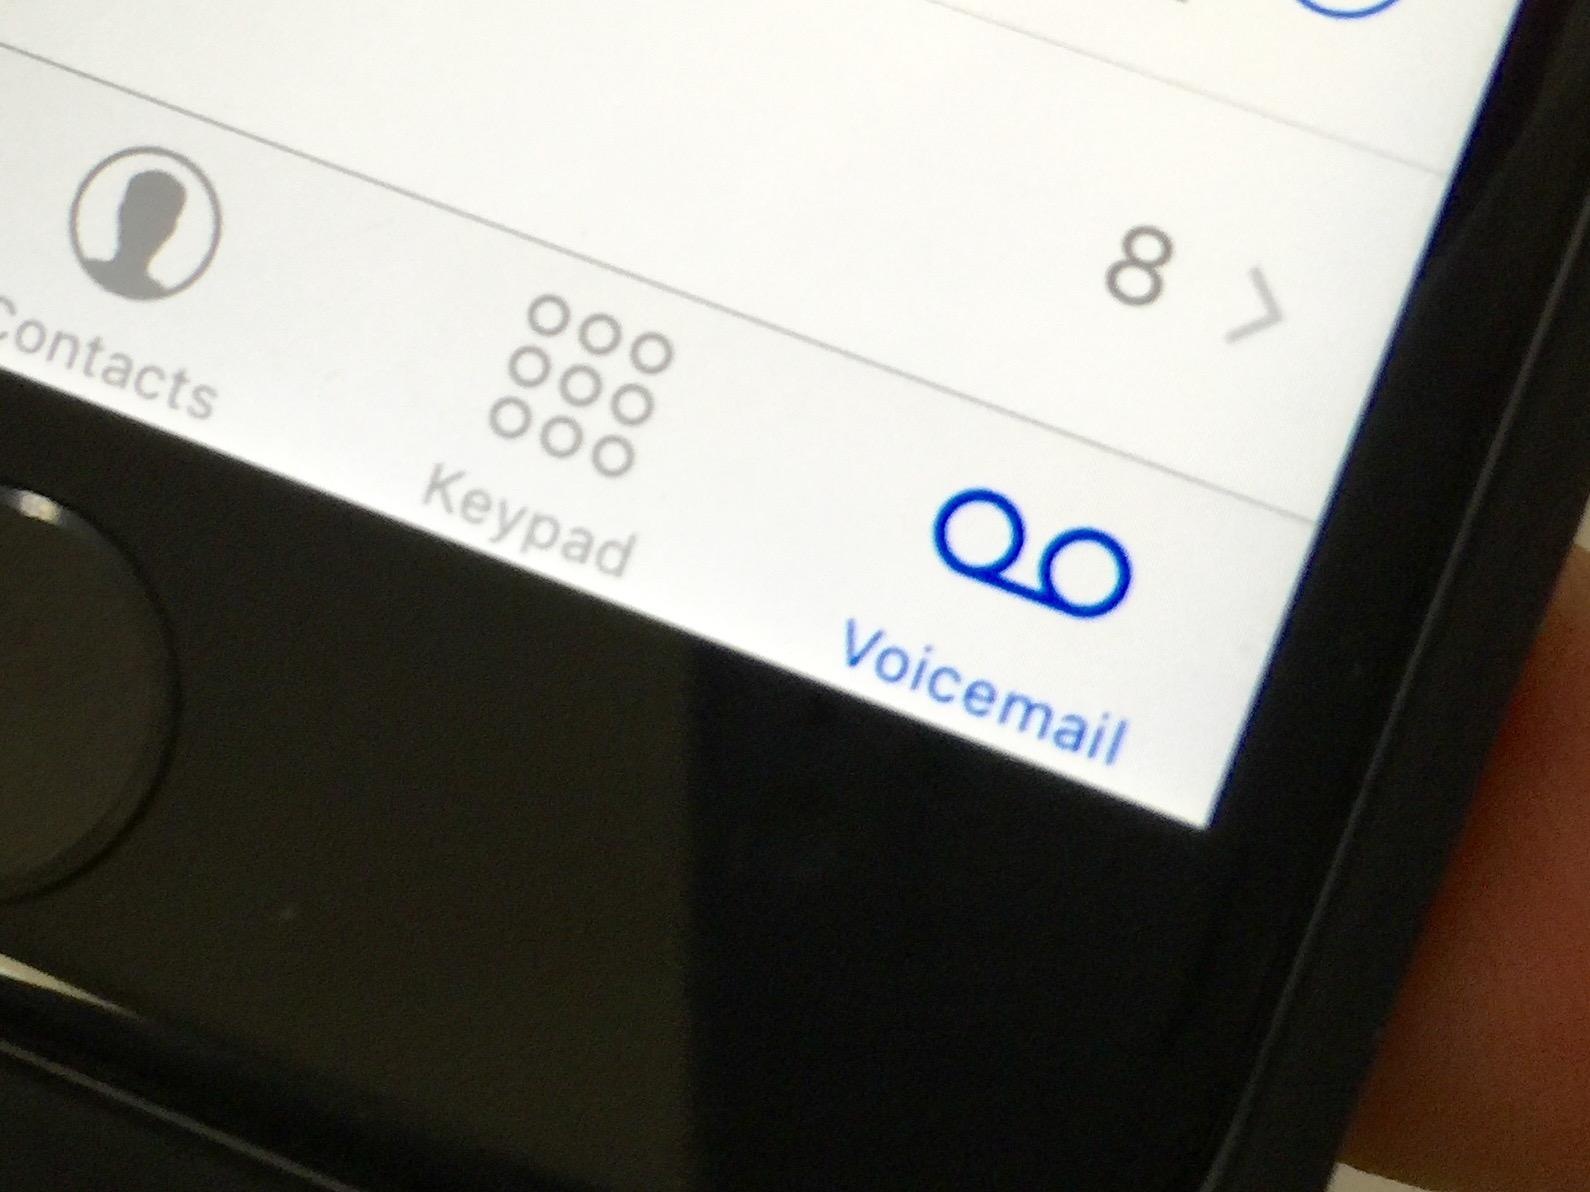 Numero de telefono del hospital penna